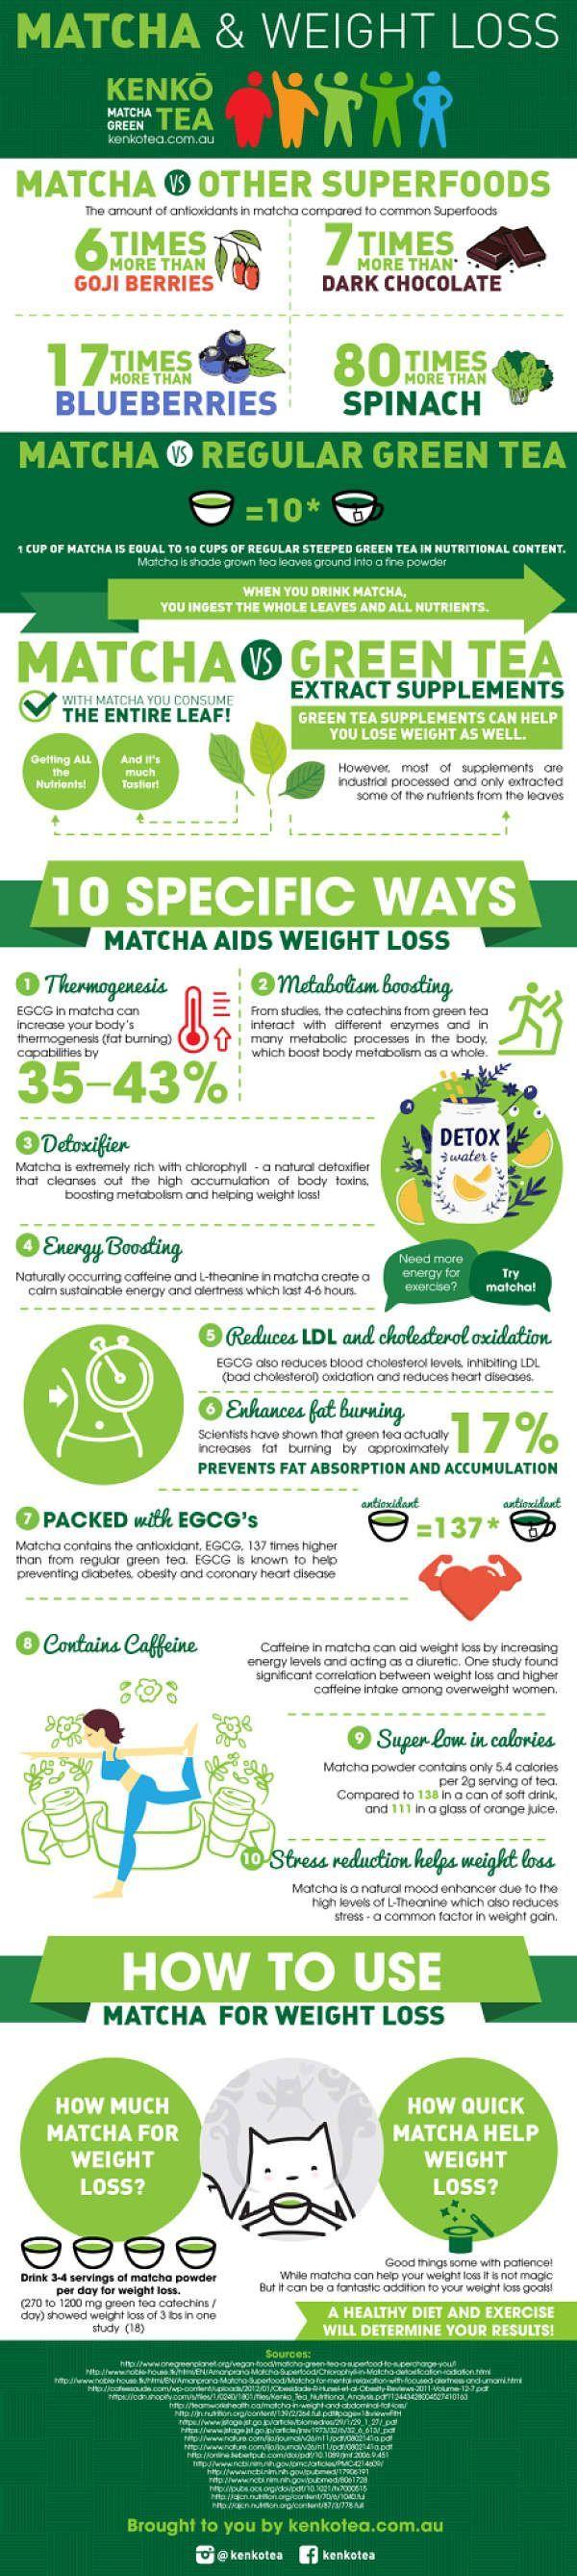 Matcha Green Tea health Benefits Infographic. Try Mango Lime Matcha Sparkling Tea from Bhakti to get your match a fix | drinkbhakti.com